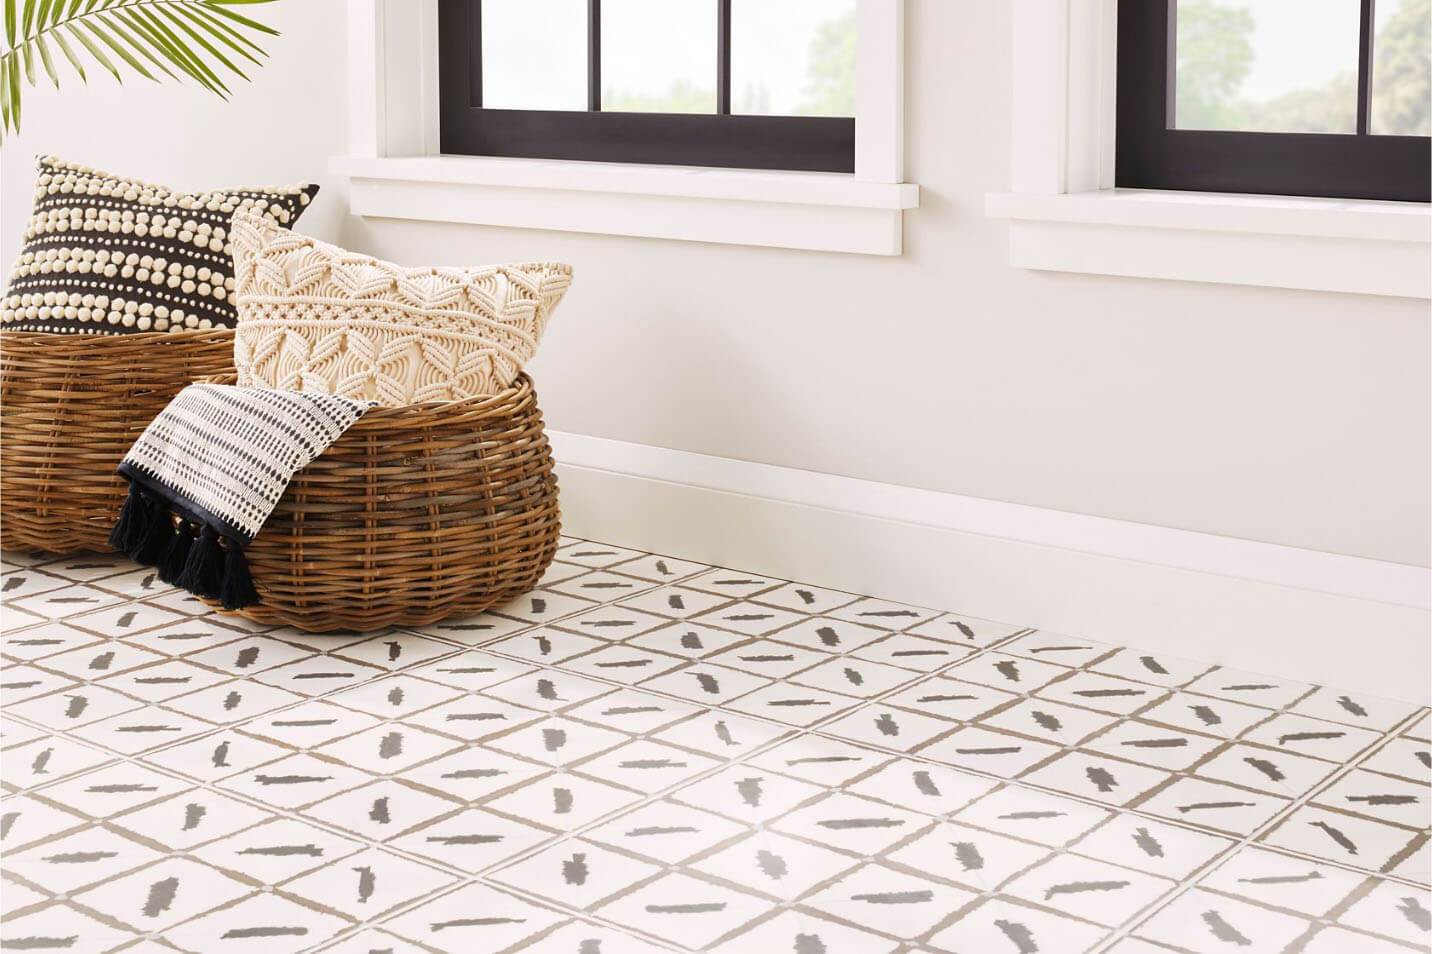 annie selke ikat ceramic tiles